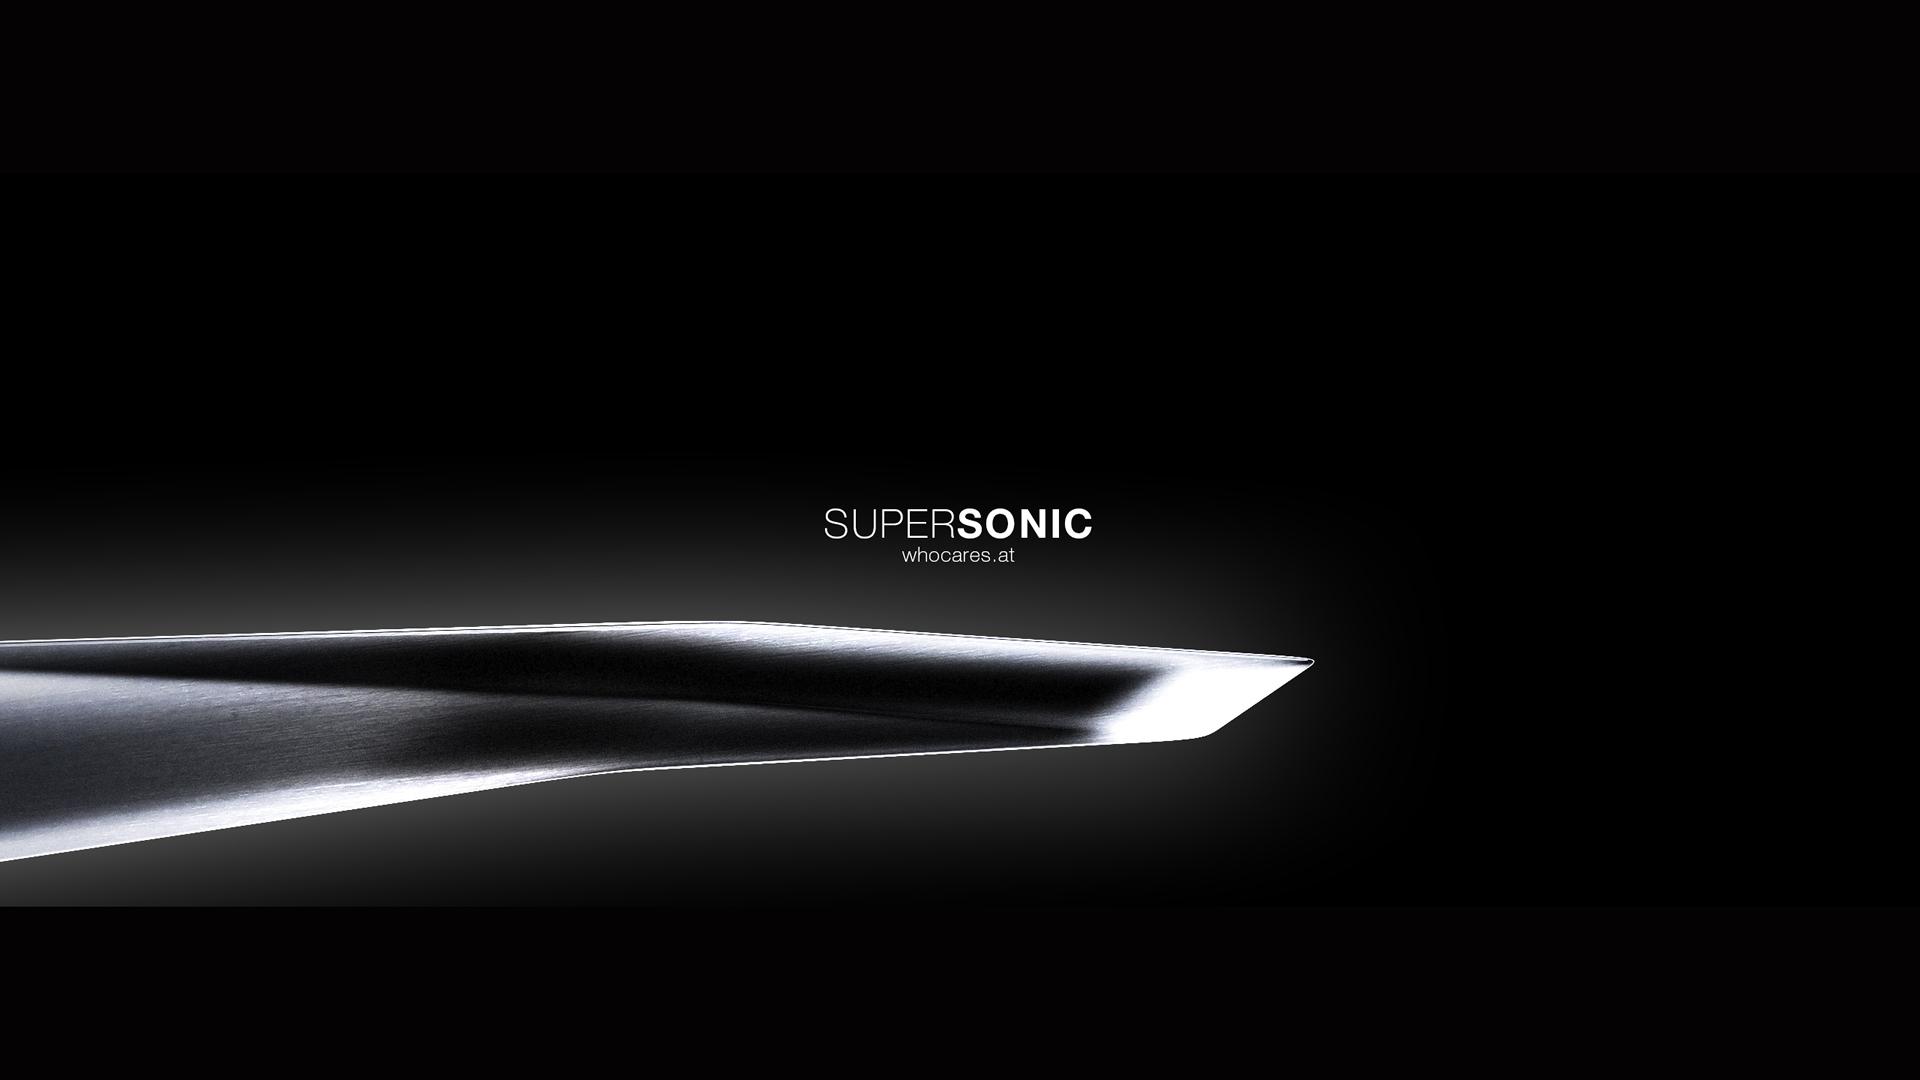 SUPERSONIC 004.jpg